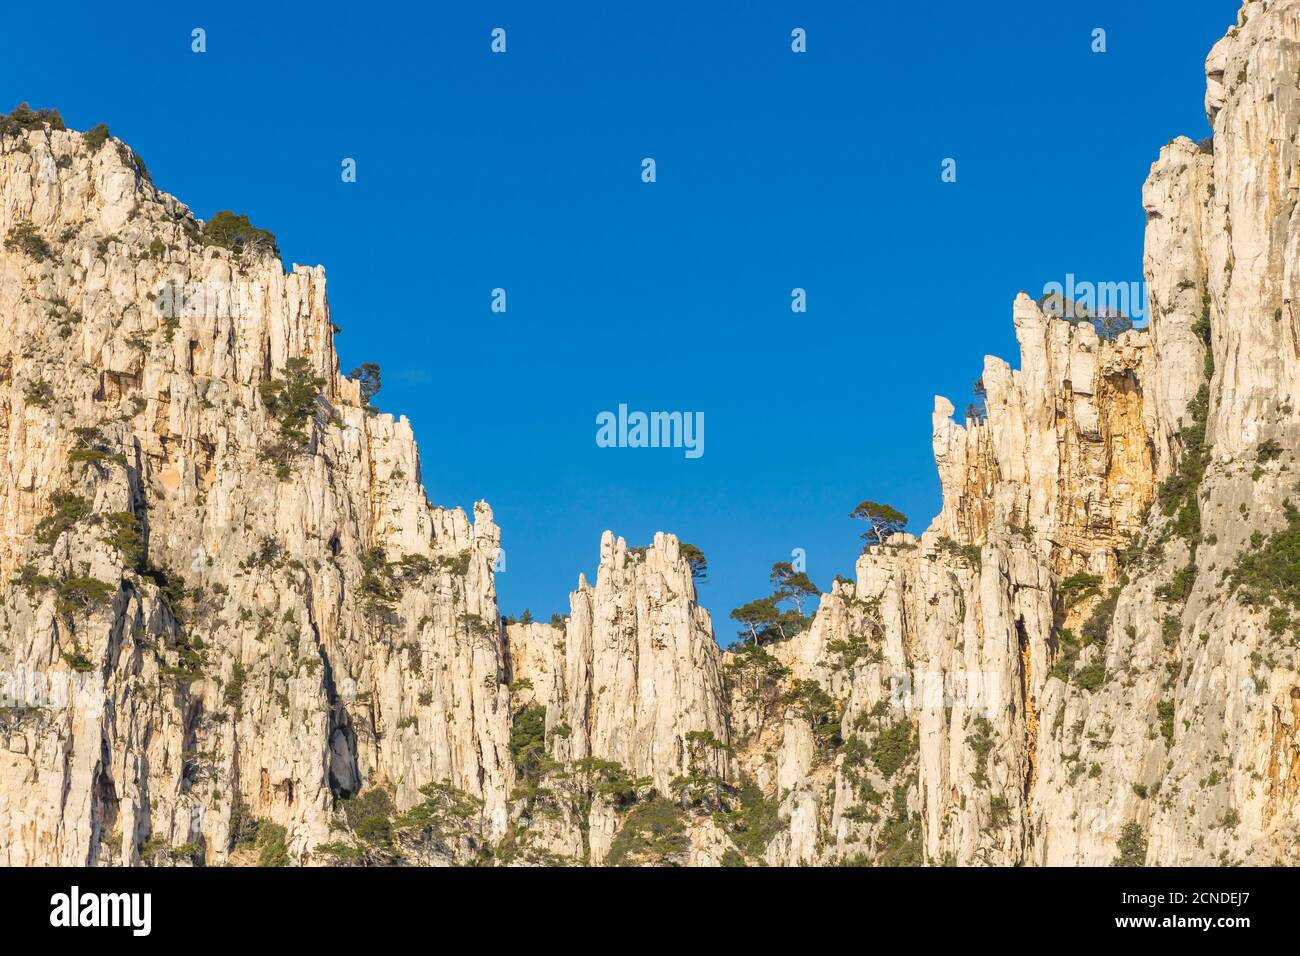 Rock formation at Calanque de l'Oule, Calanque National Park, Marseille, Bouches du Rhone, Provence, France, Europe Stock Photo